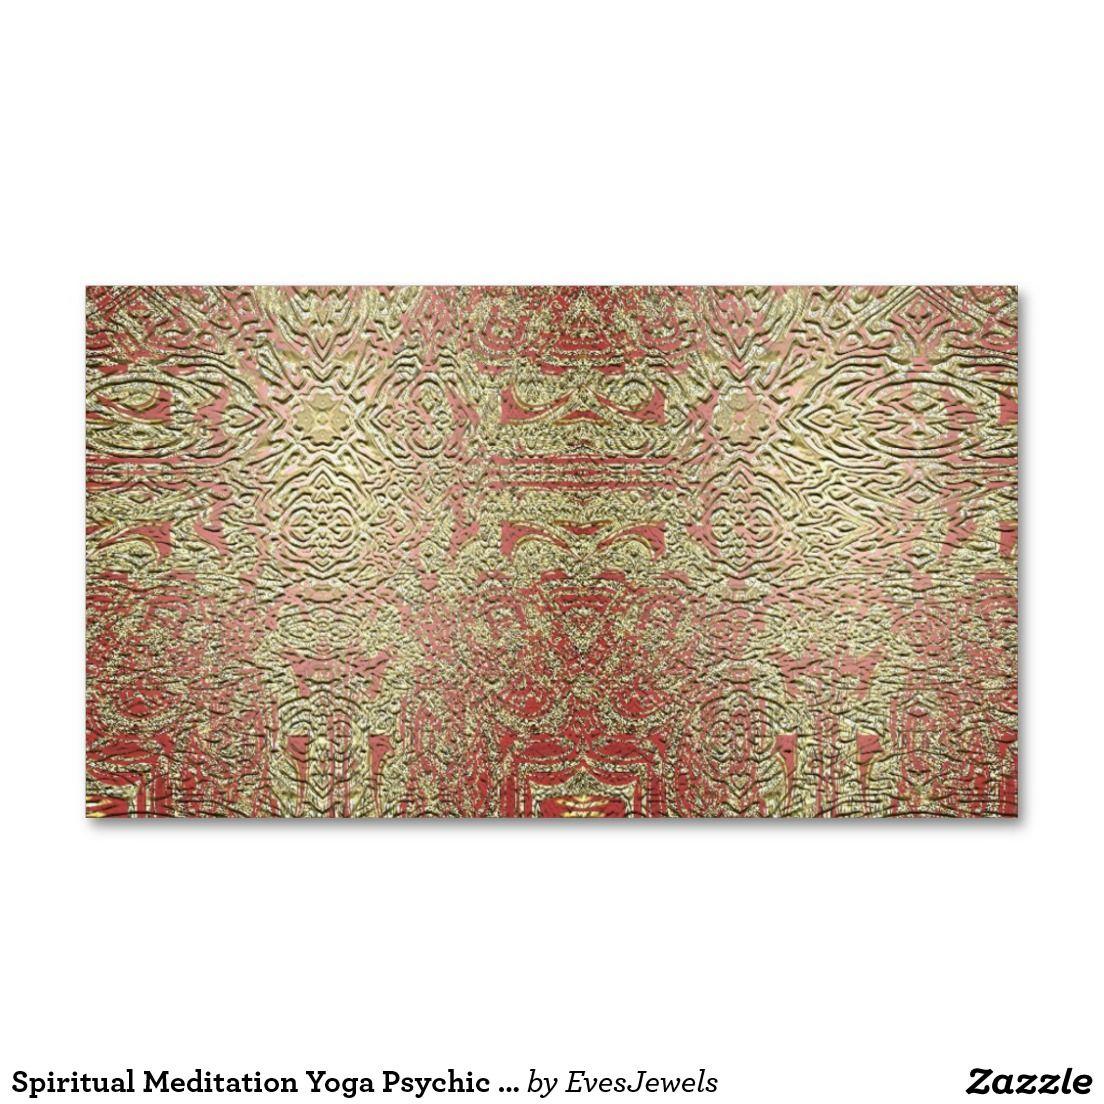 Spiritual Meditation Yoga Psychic Business Cards | Pinterest ...